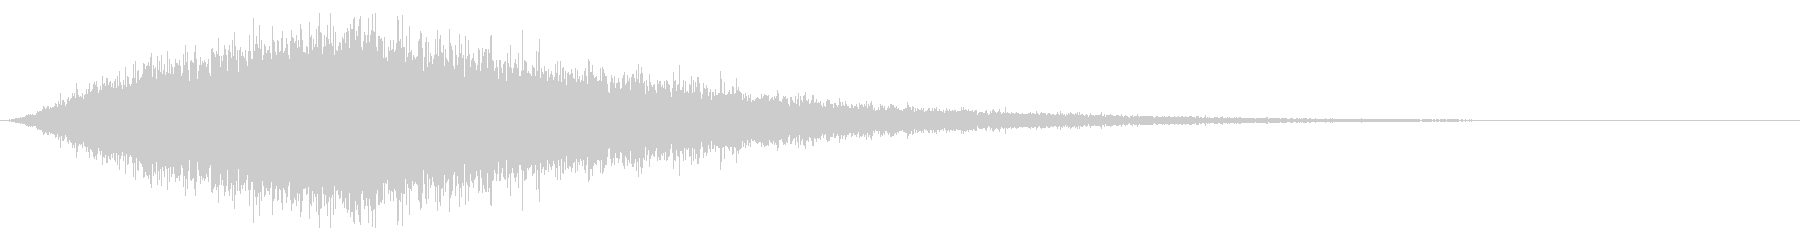 Dark_Attack-50の未再生の波形